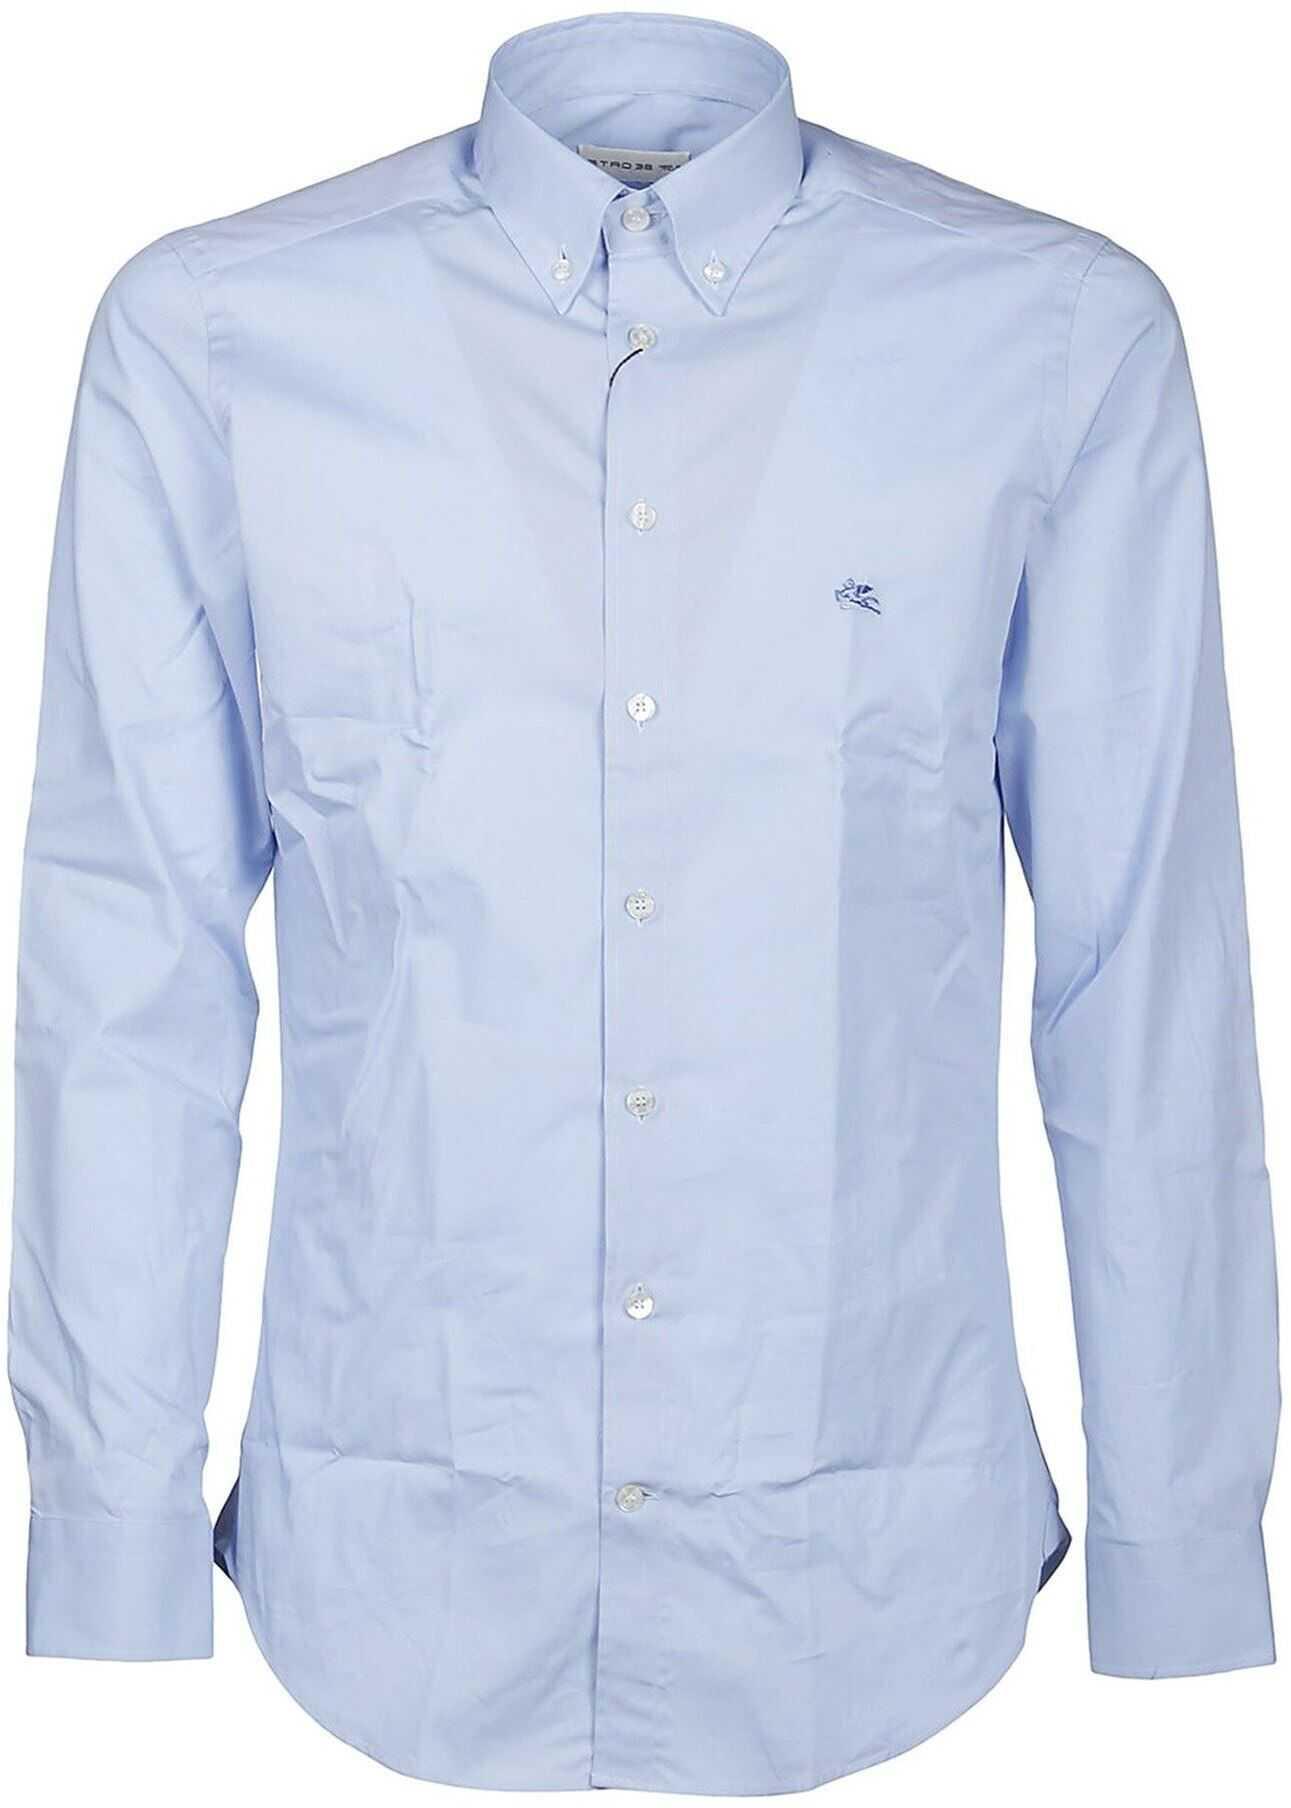 ETRO Cotton Shirt Light Blue imagine